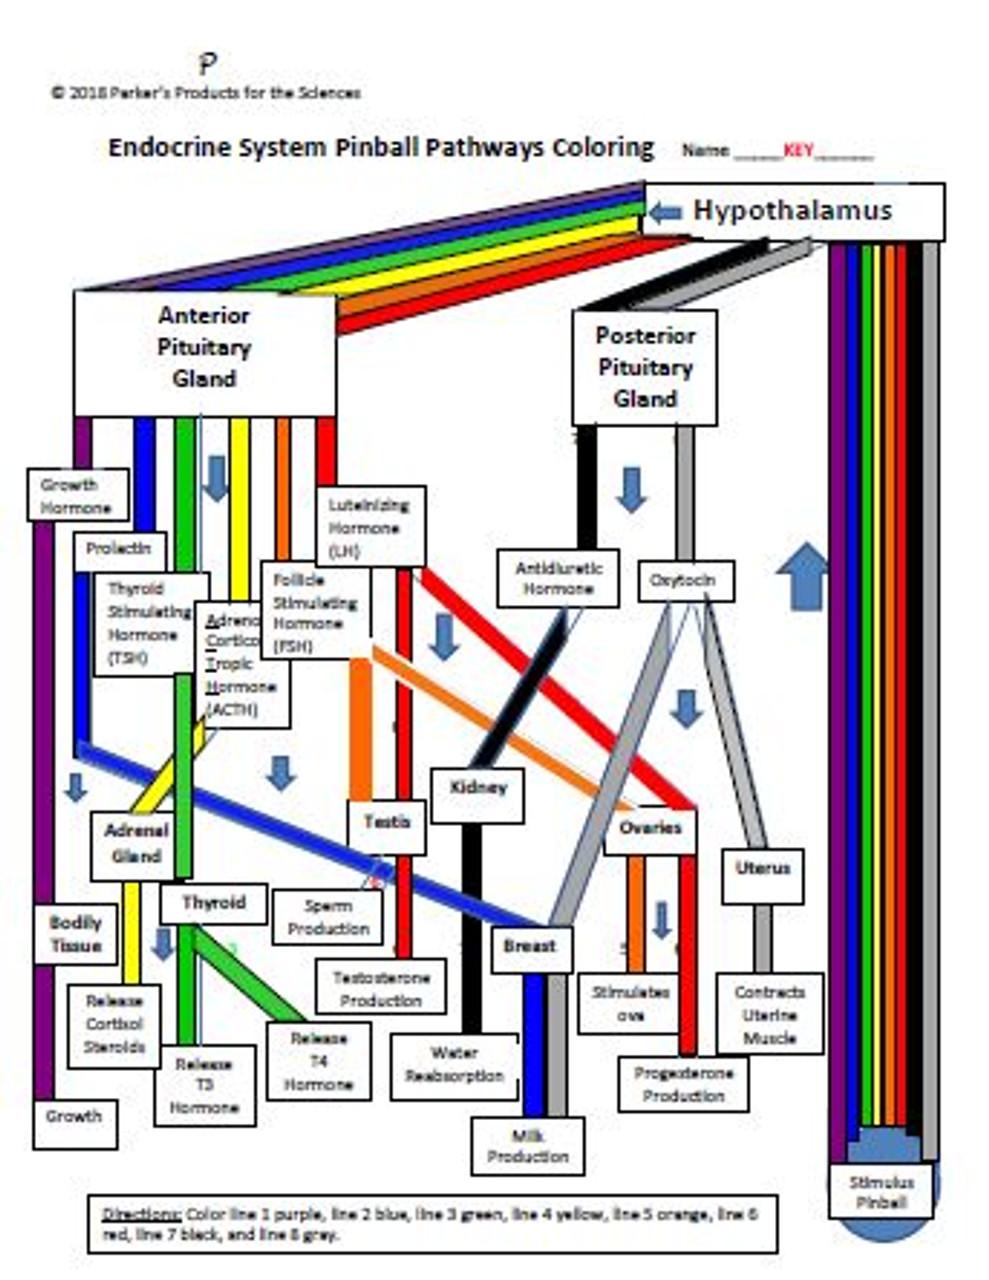 Endocrine System Pinball Pathways Coloring Worksheet